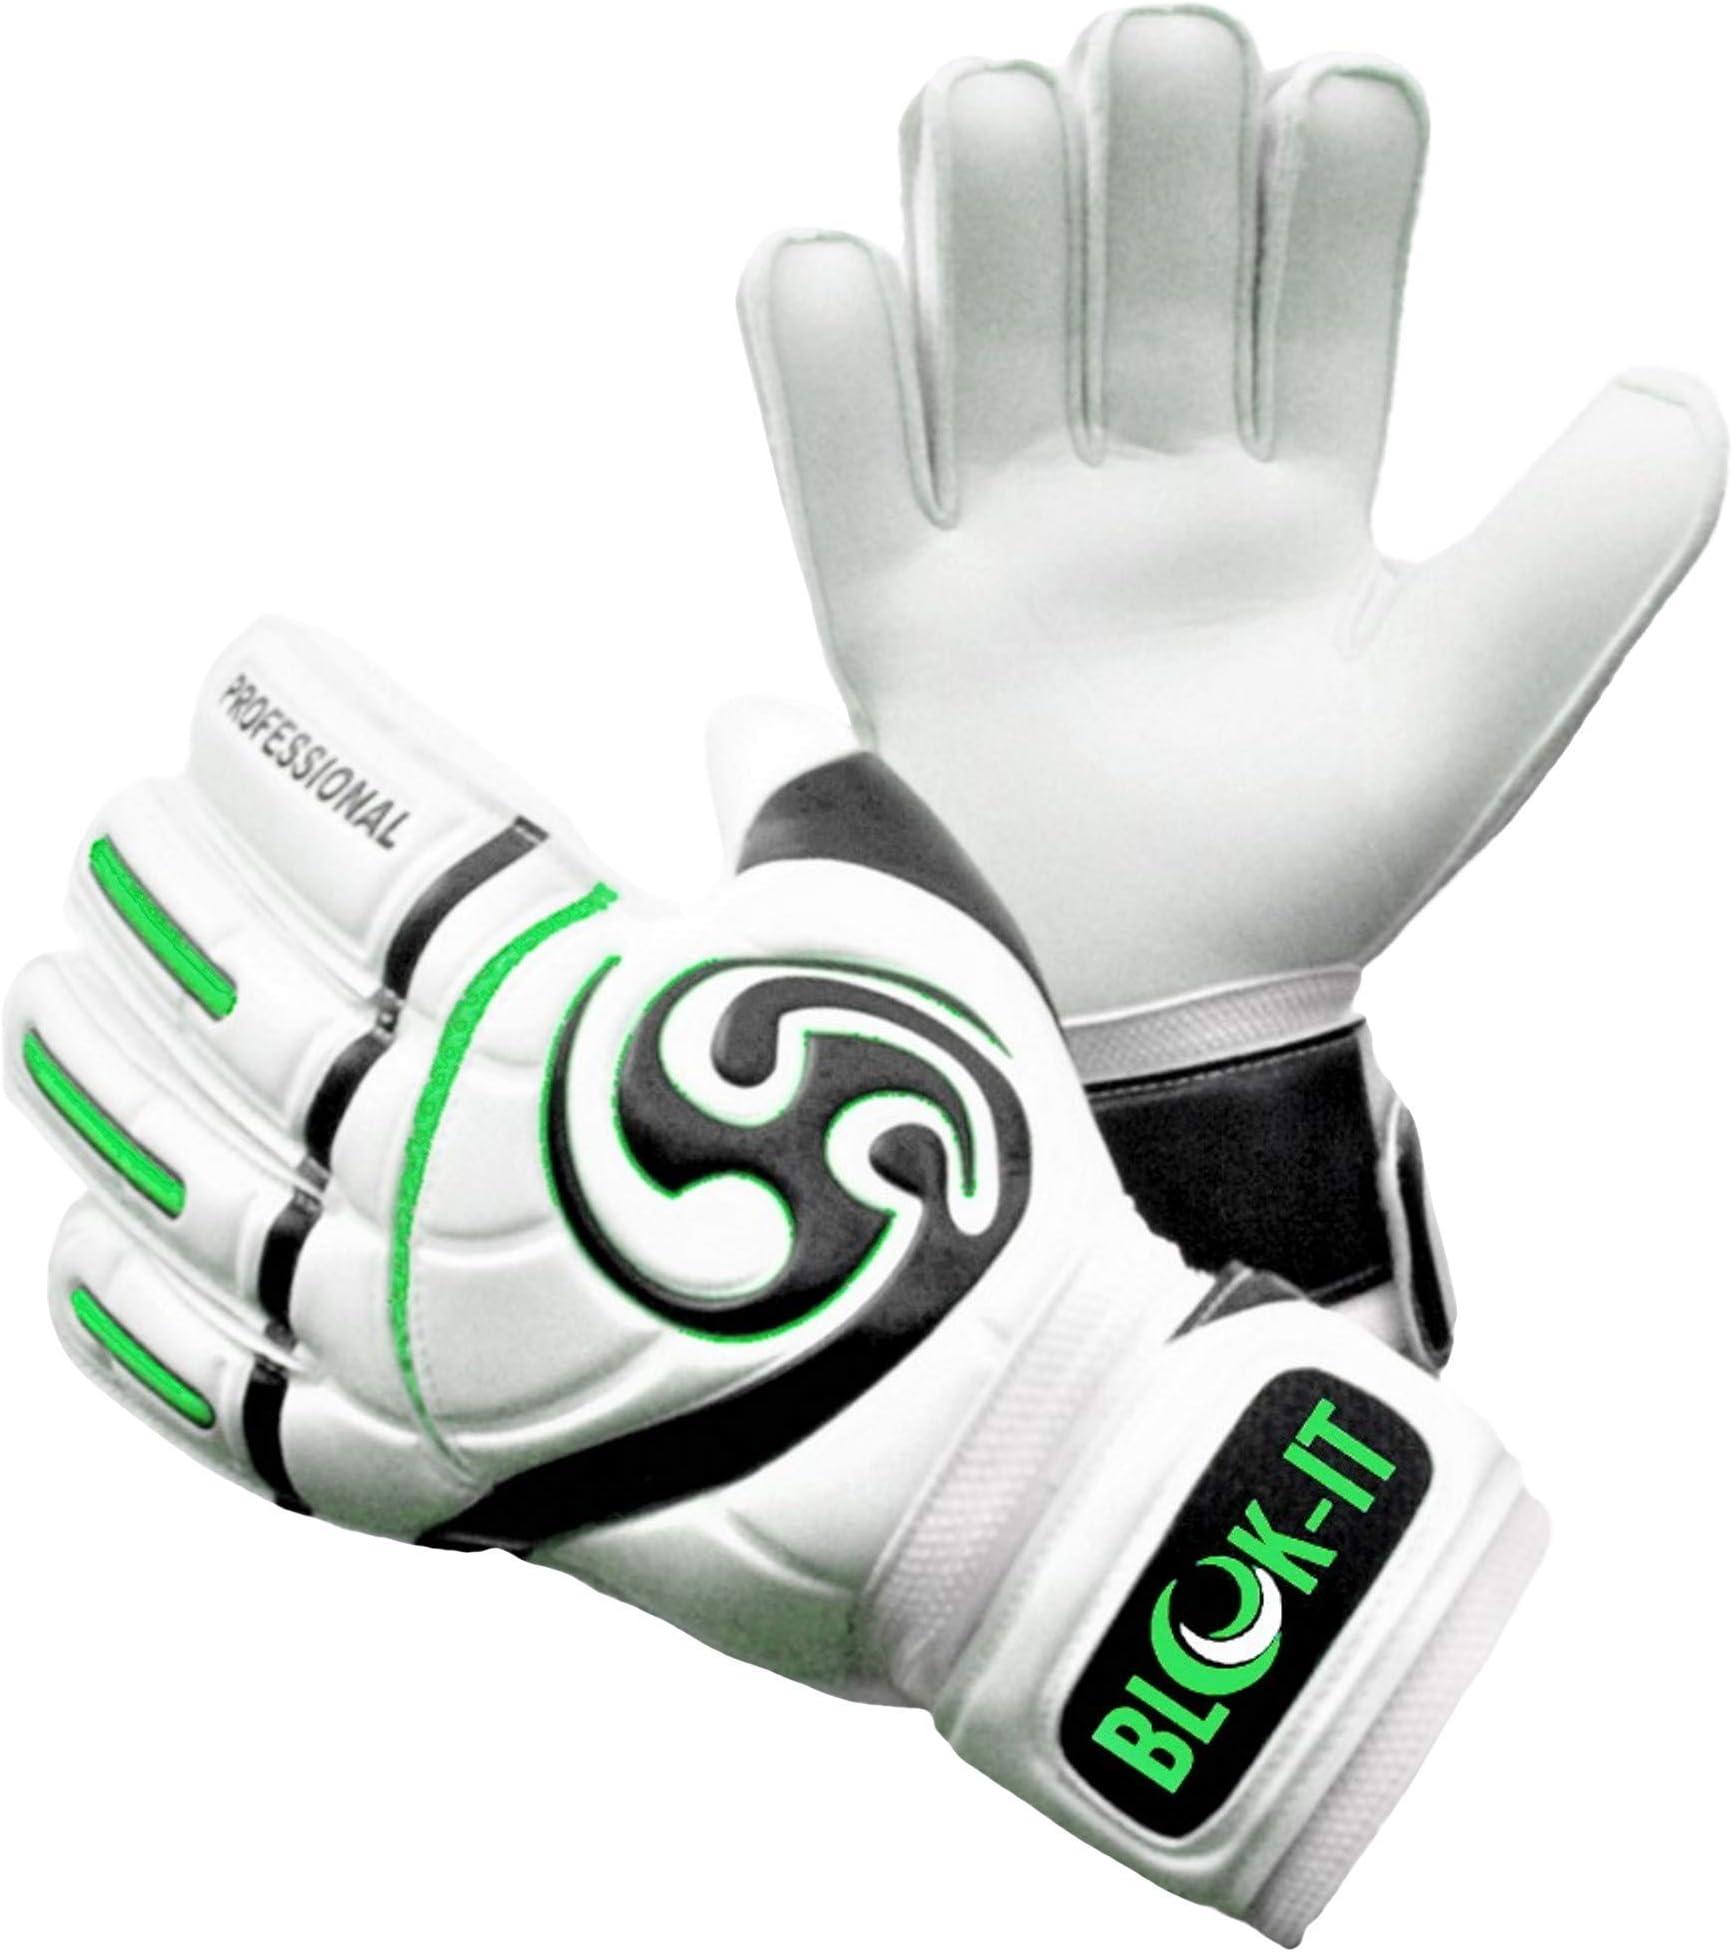 Vulcan Trident Soccer Goalie Goalkeeper Gloves Fingersave Youth Adult Size 7-11